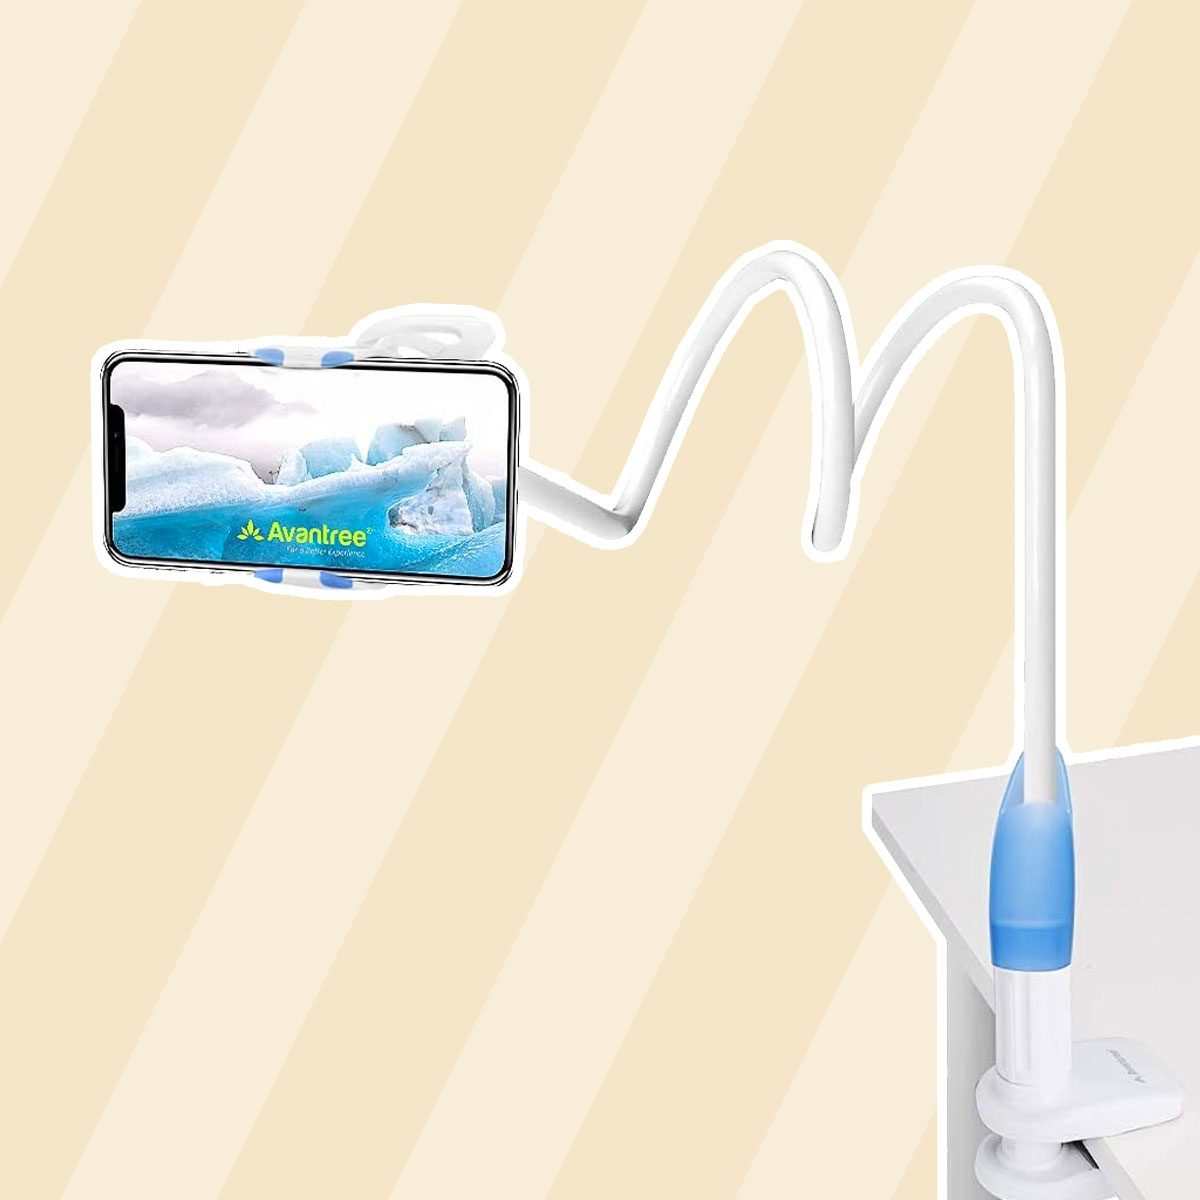 Avantree CP901 Gooseneck Phone Holder Clamp for Bed Desk Bedside Table